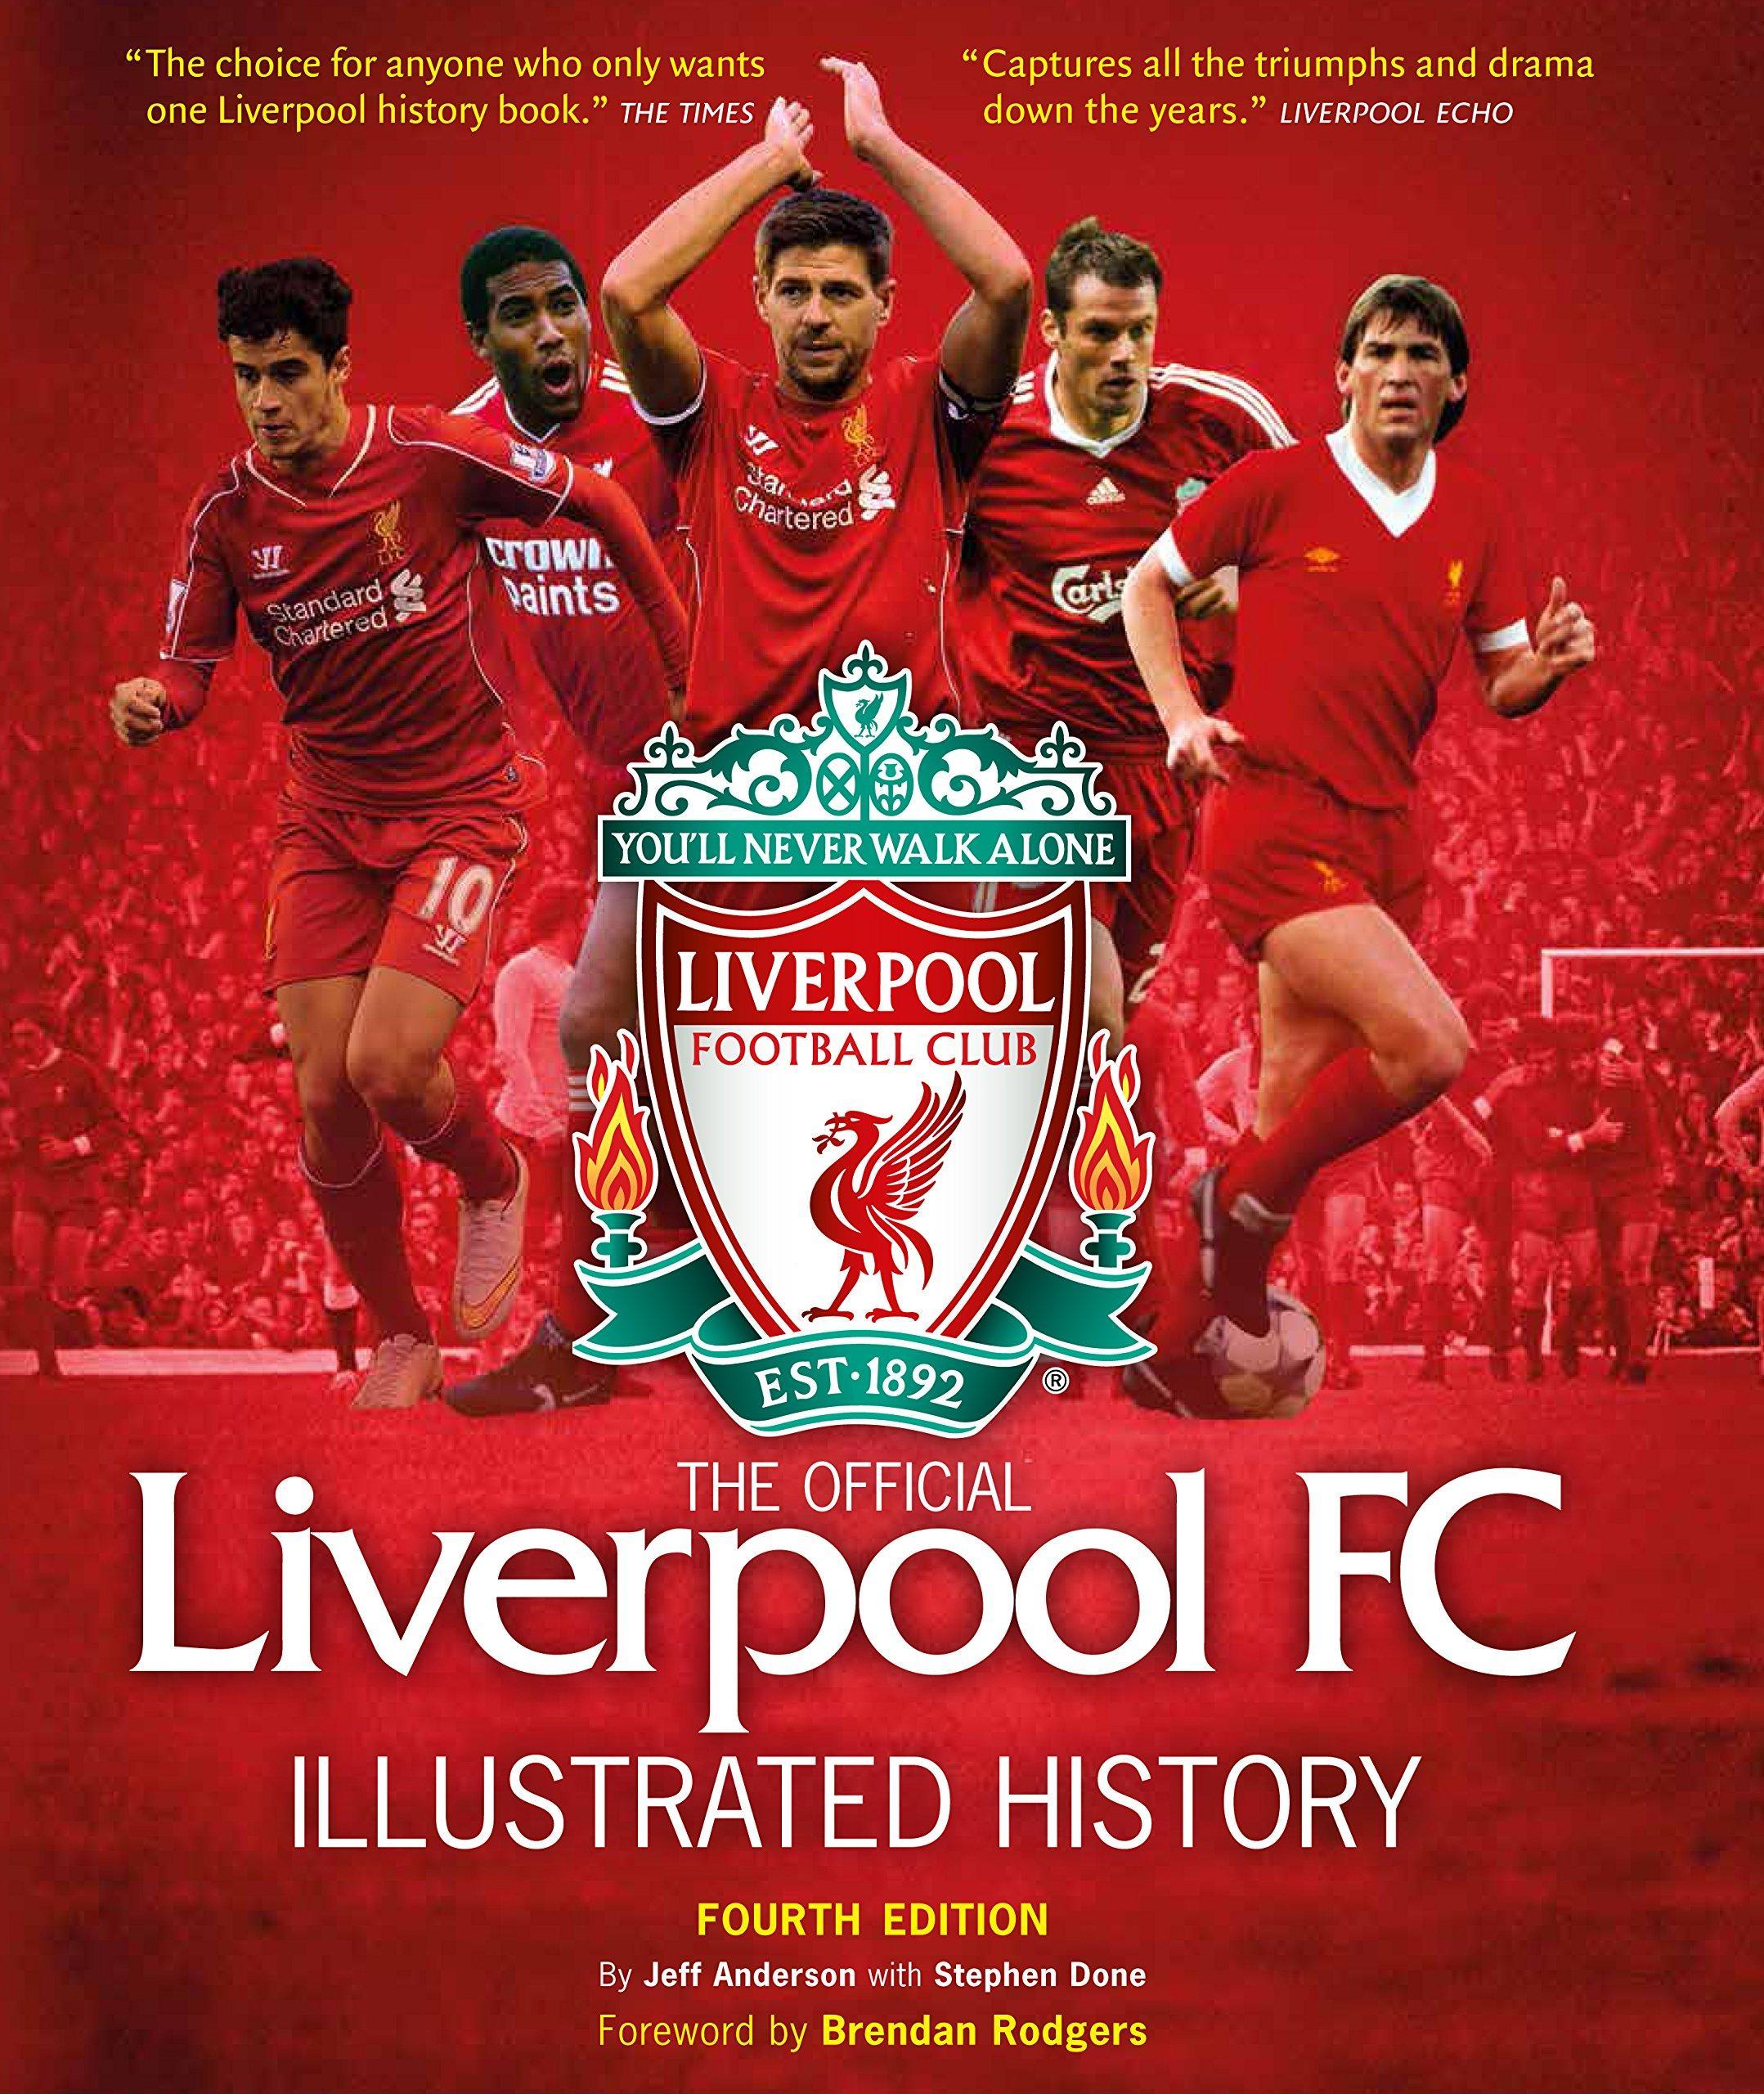 Liverpool 2019 Wallpapers - Wallpaper Cave